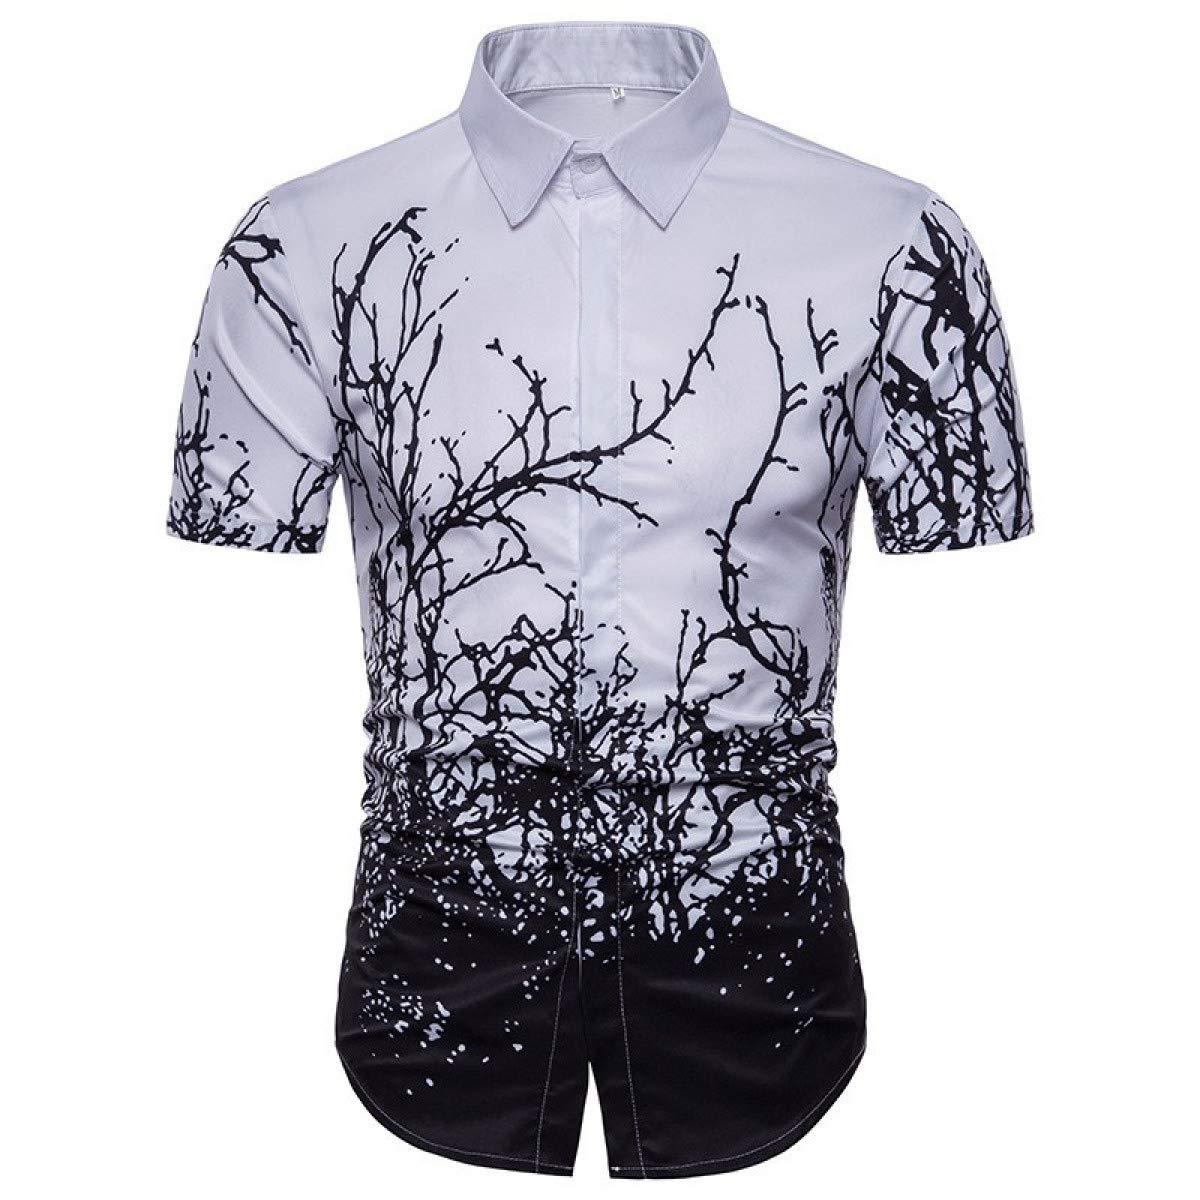 Aloha Shirt Men Fashion 3D Tree Branchs Summer New Short Sleeve Casual Dress Shirt Men Slim Fit